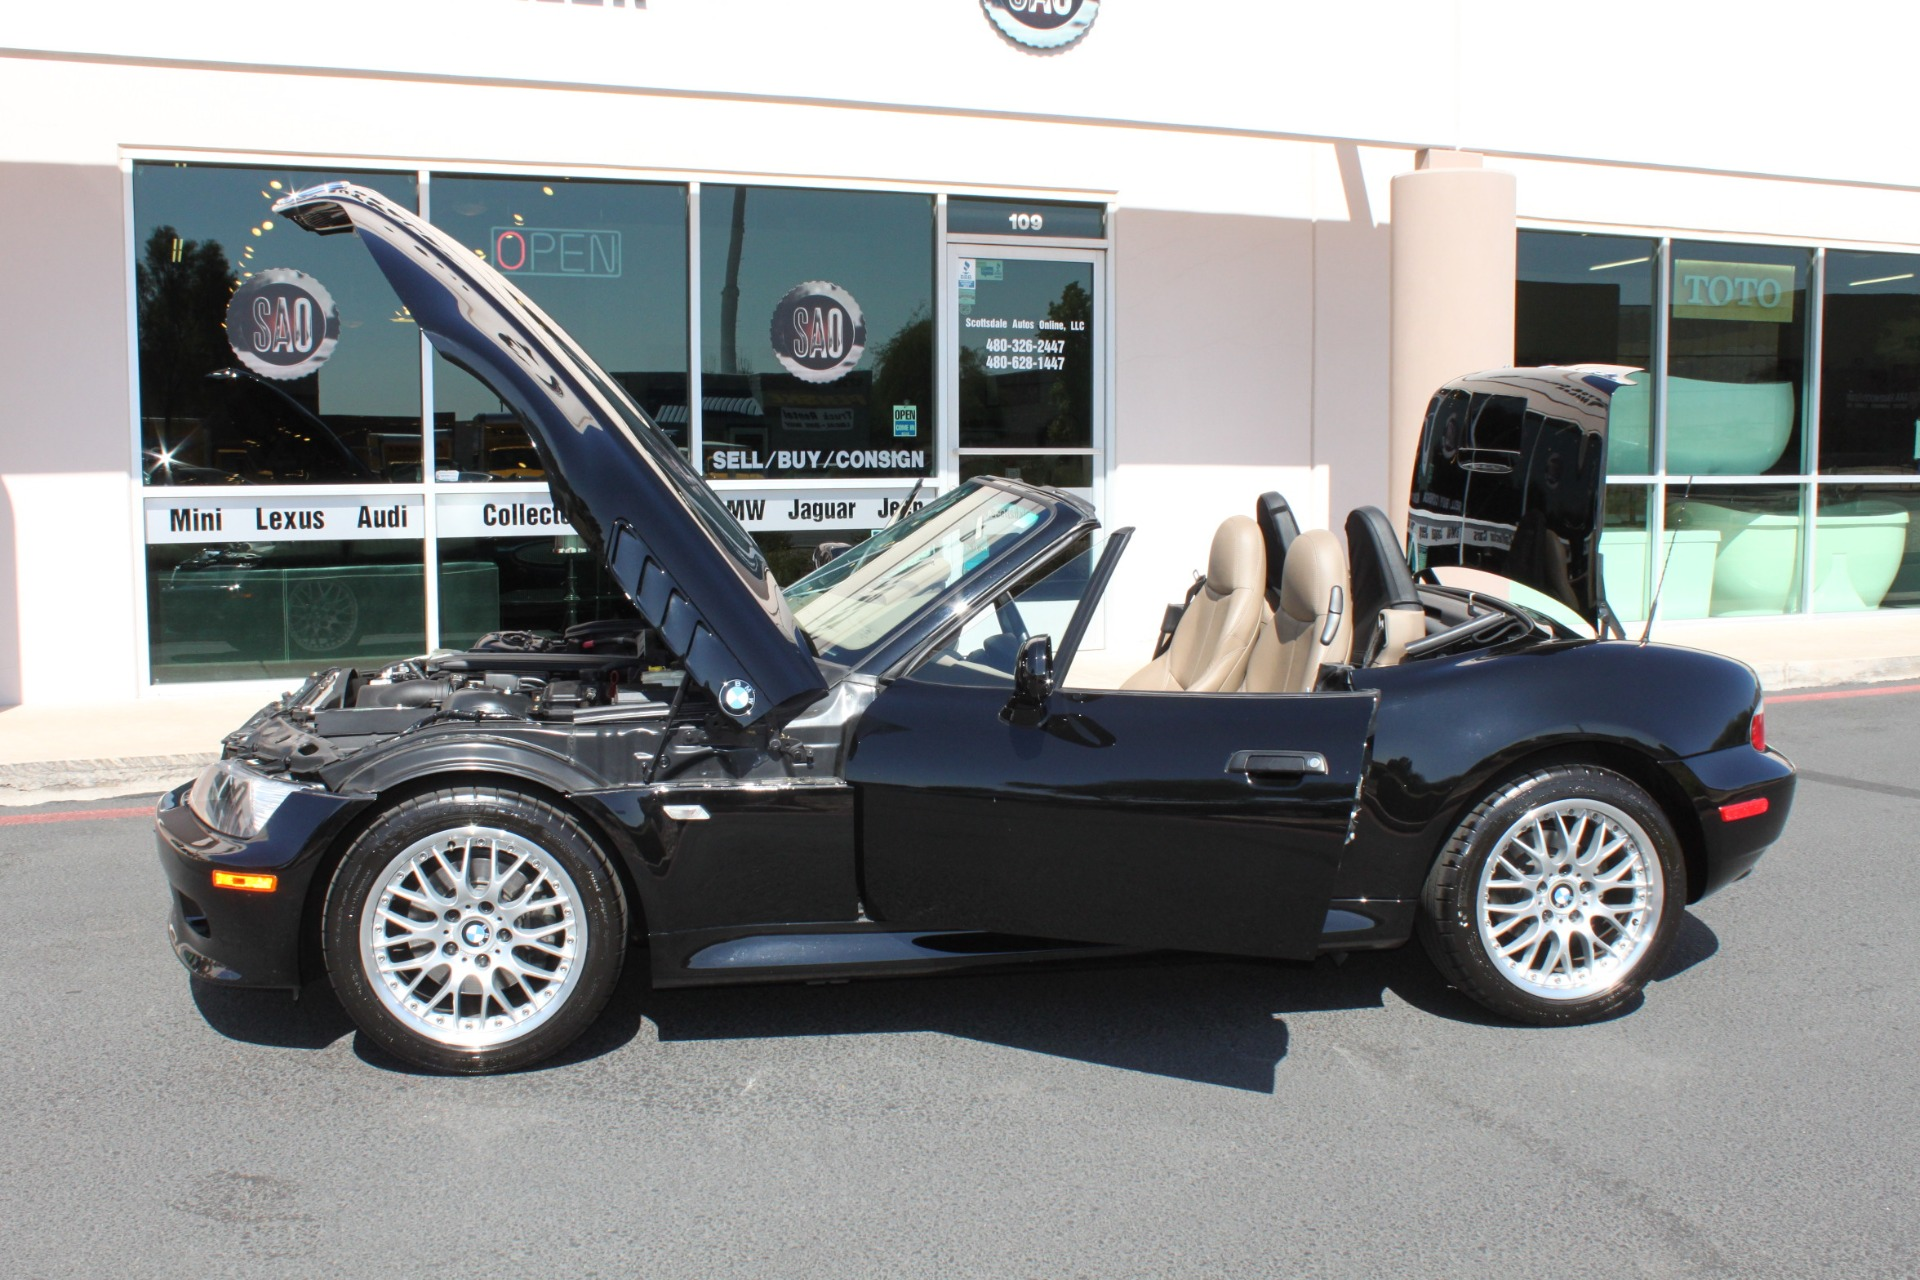 Used-2001-BMW-Z3-Roadster-30i-Ferrari-Dealership-Lake-Forest